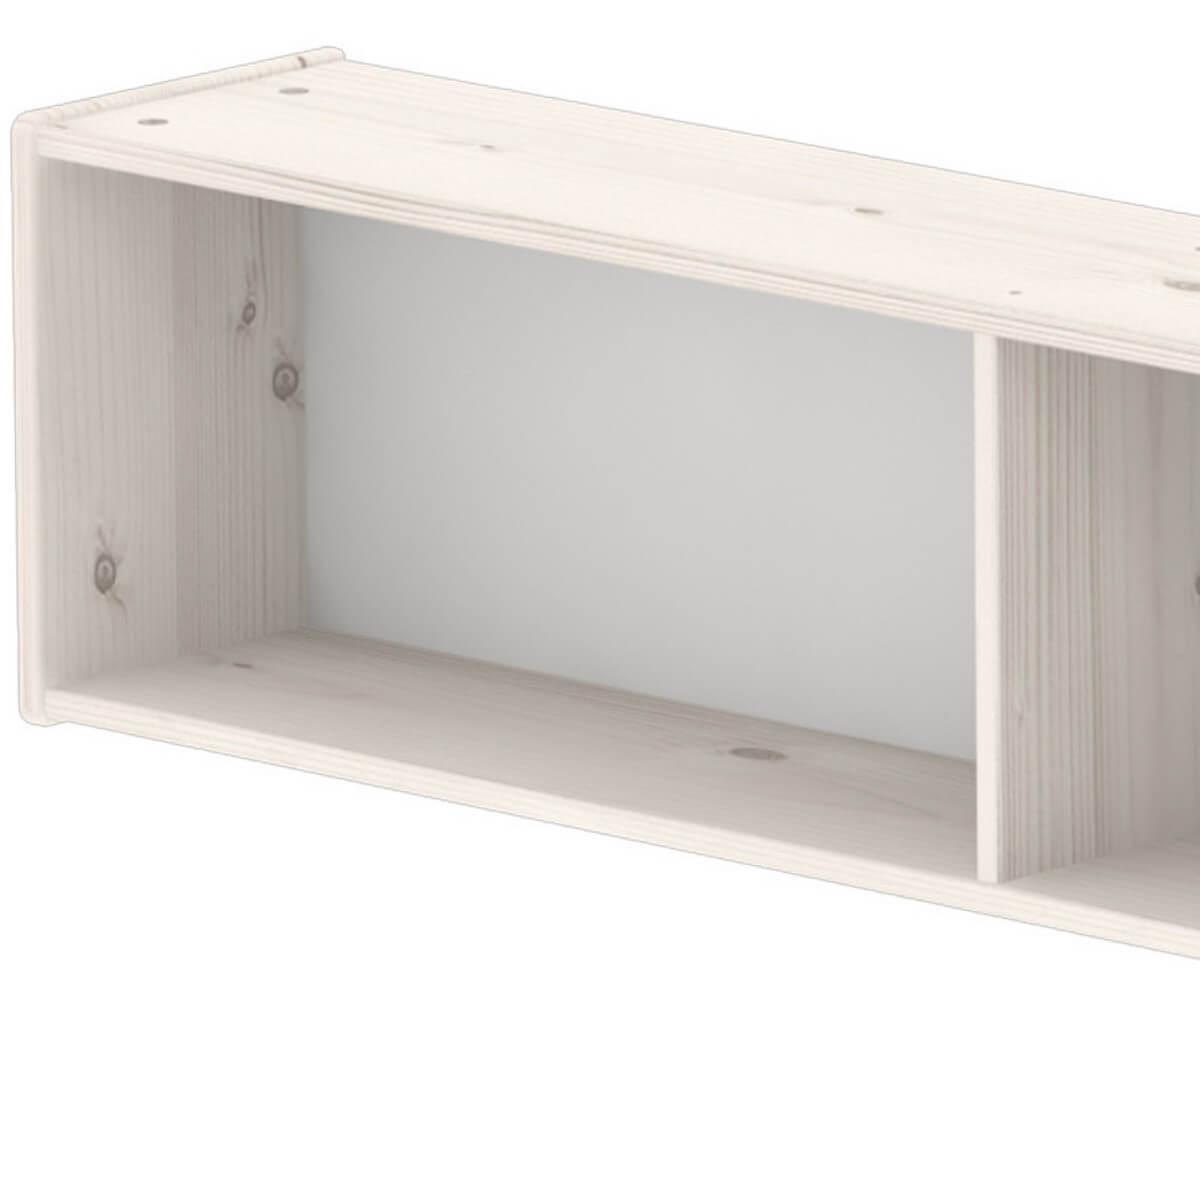 Estantería infantil de pared compartimentos 200 cm CLASSIC Flexa blanco cal